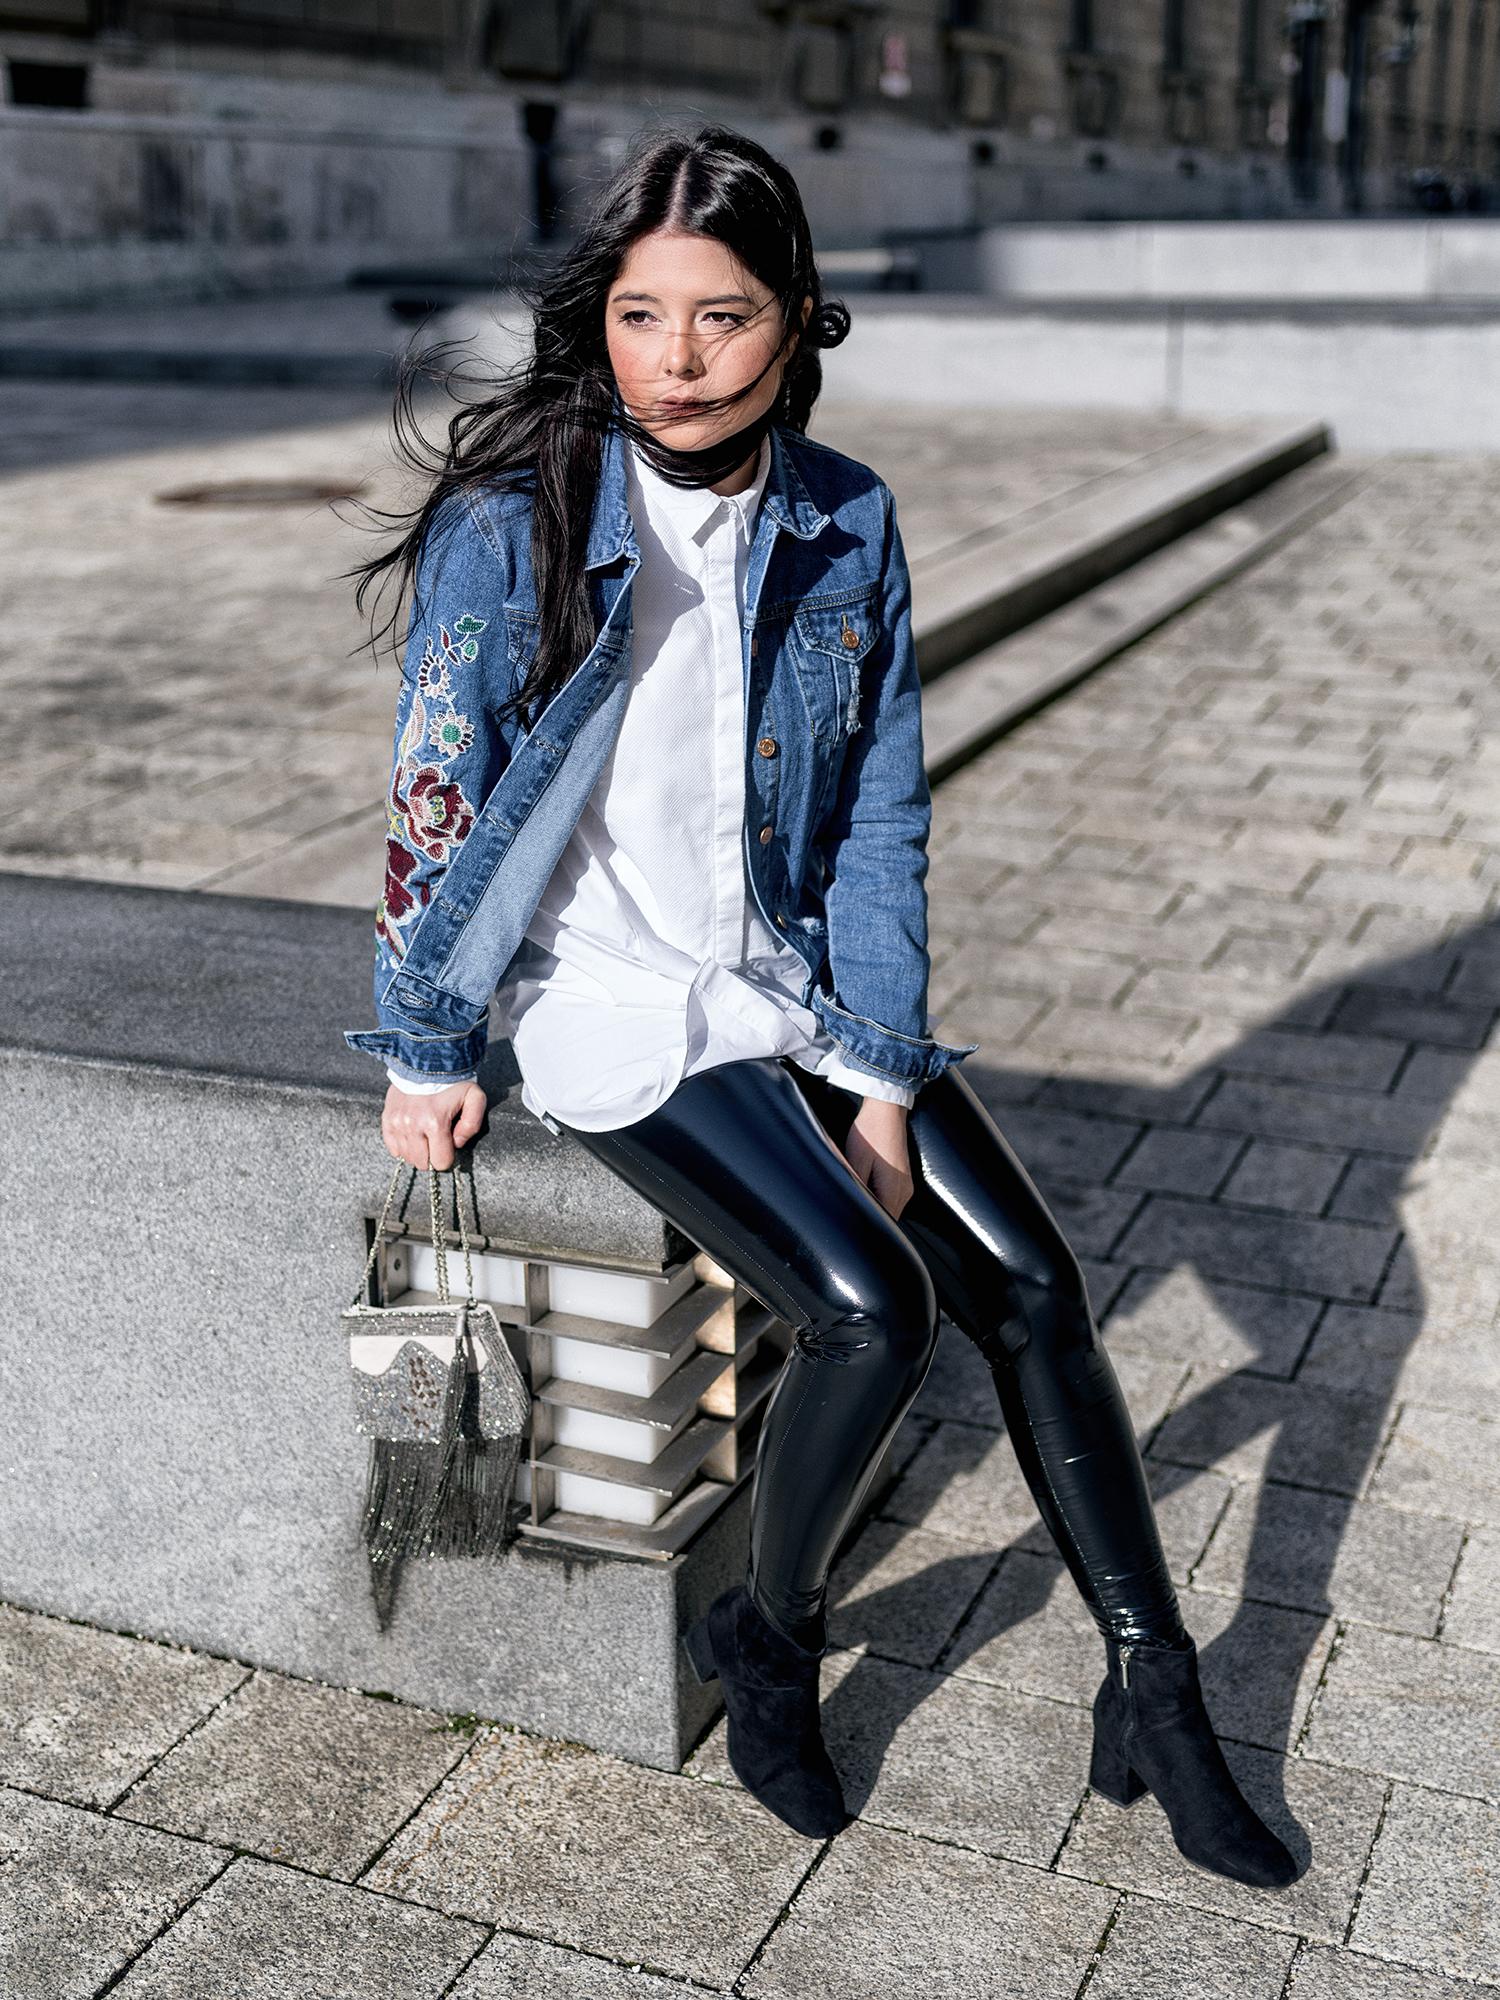 Outfit Lederhose Im Alltag Fashionambit